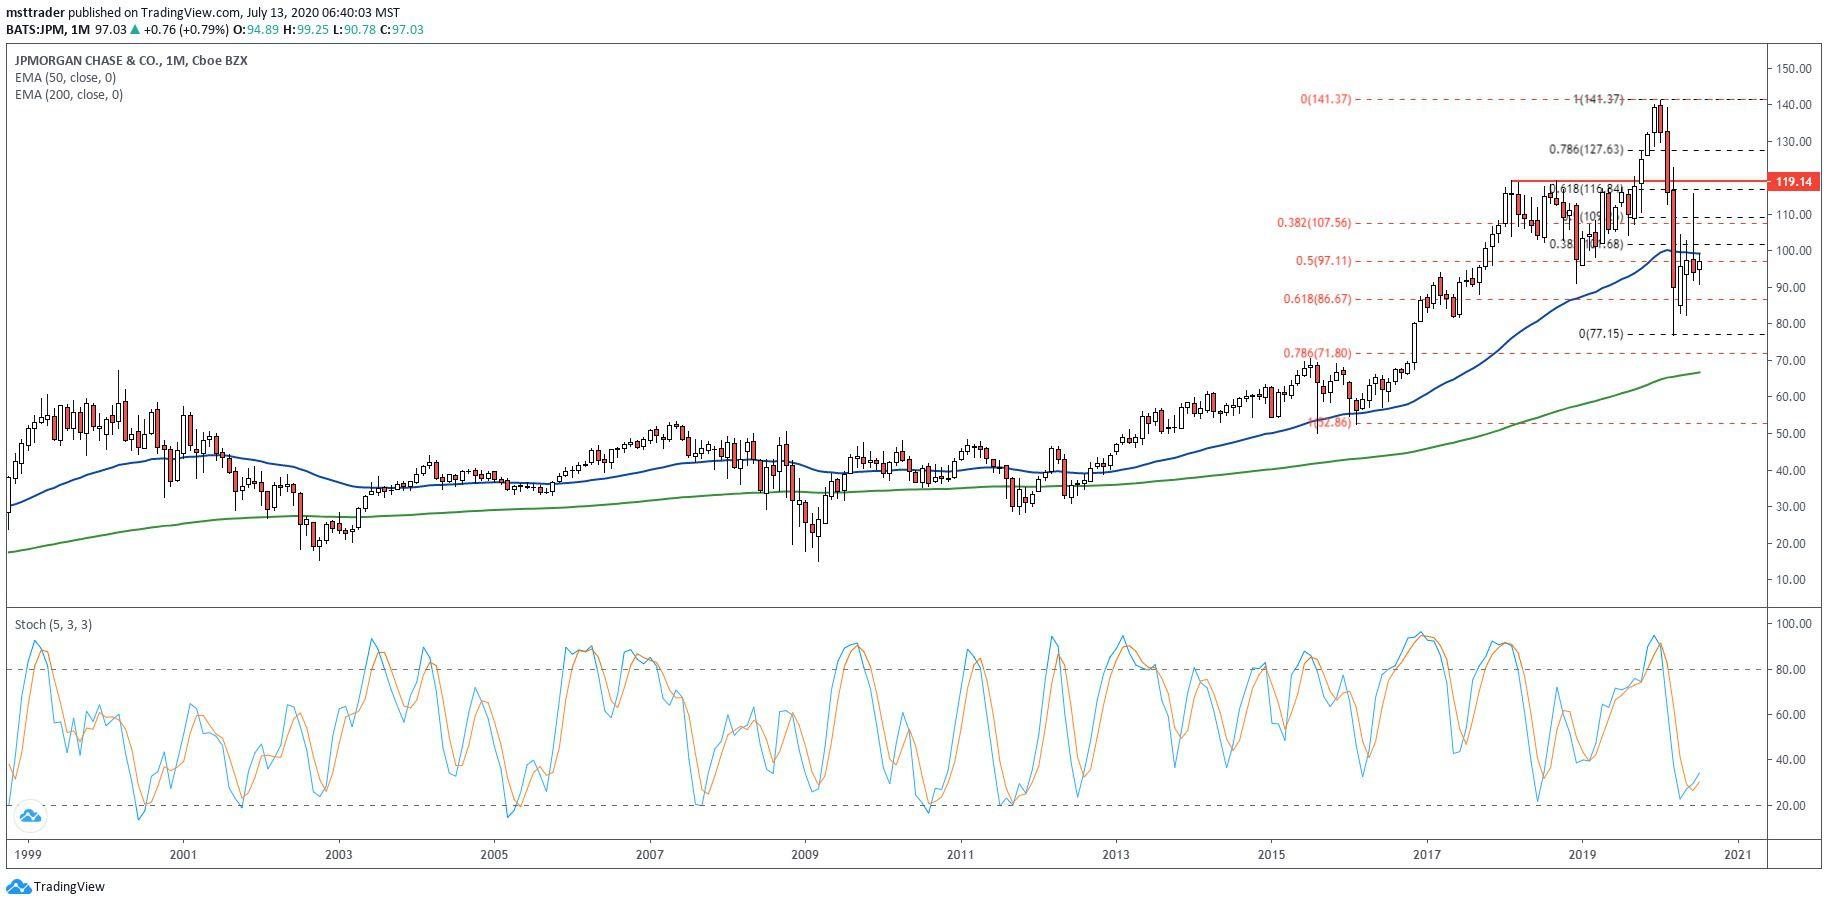 Current Stock Price Jp Morgan - STOCROT